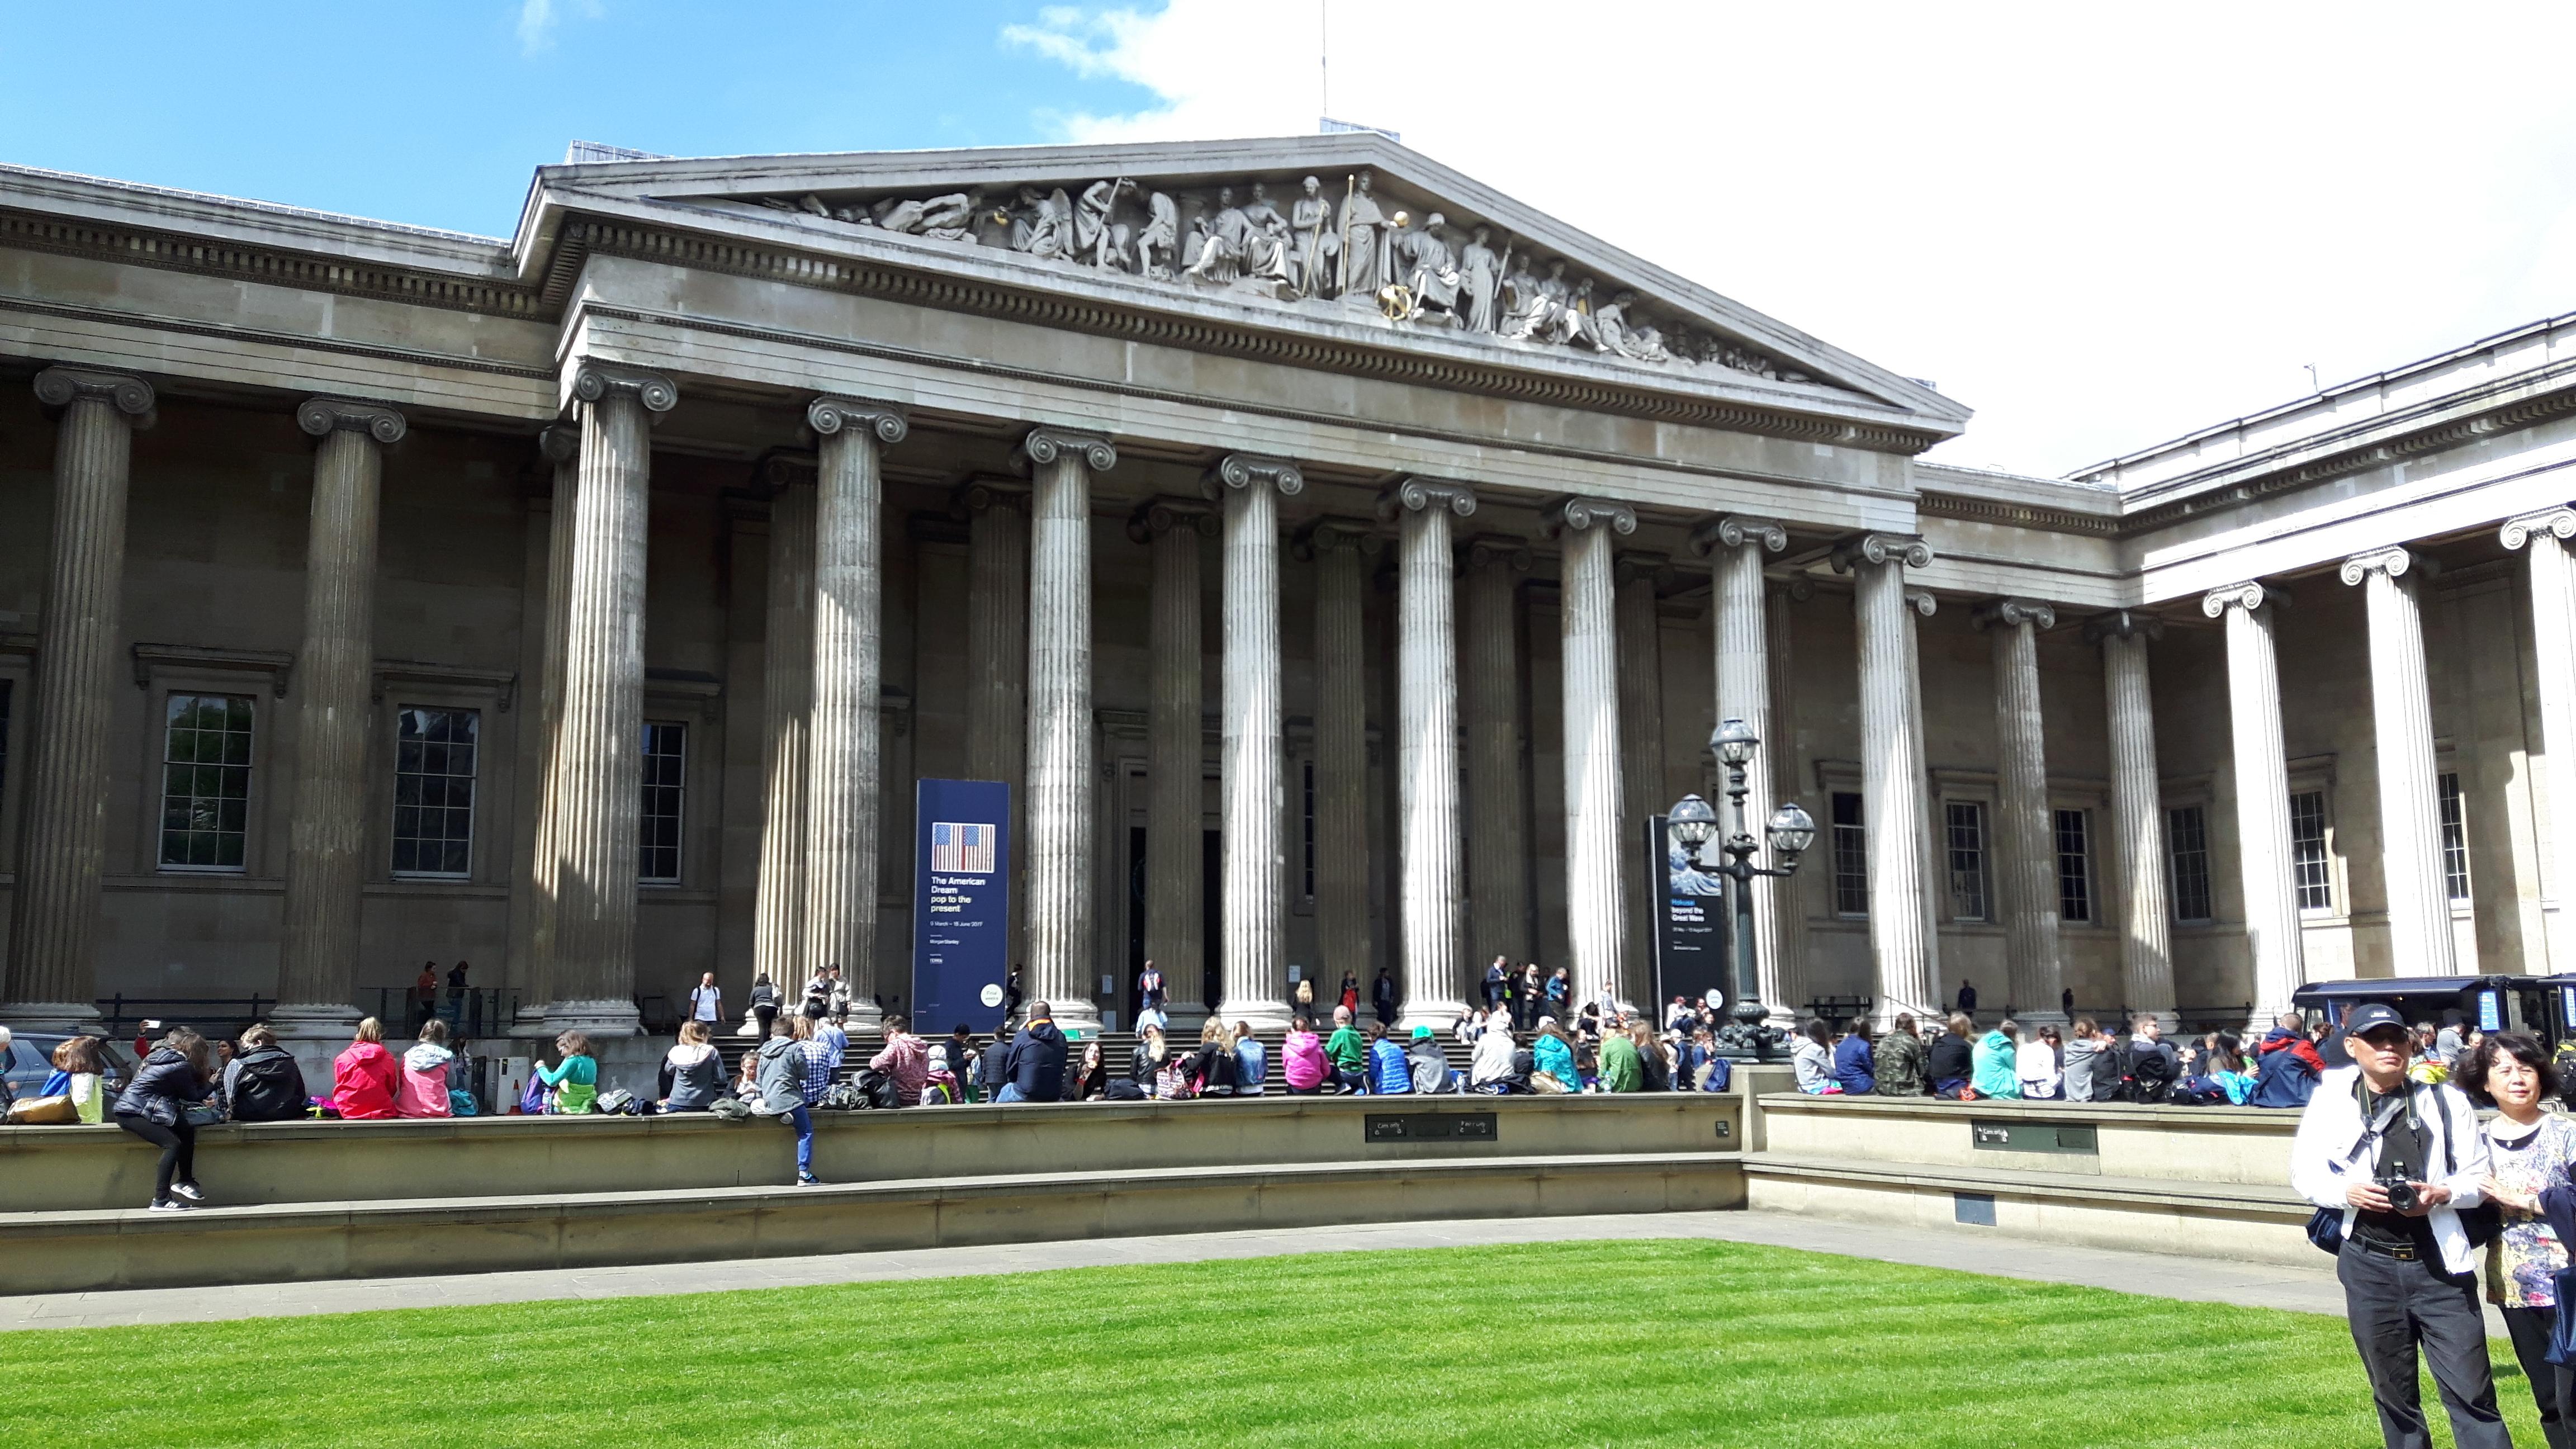 British Museum-Beautifuldreams